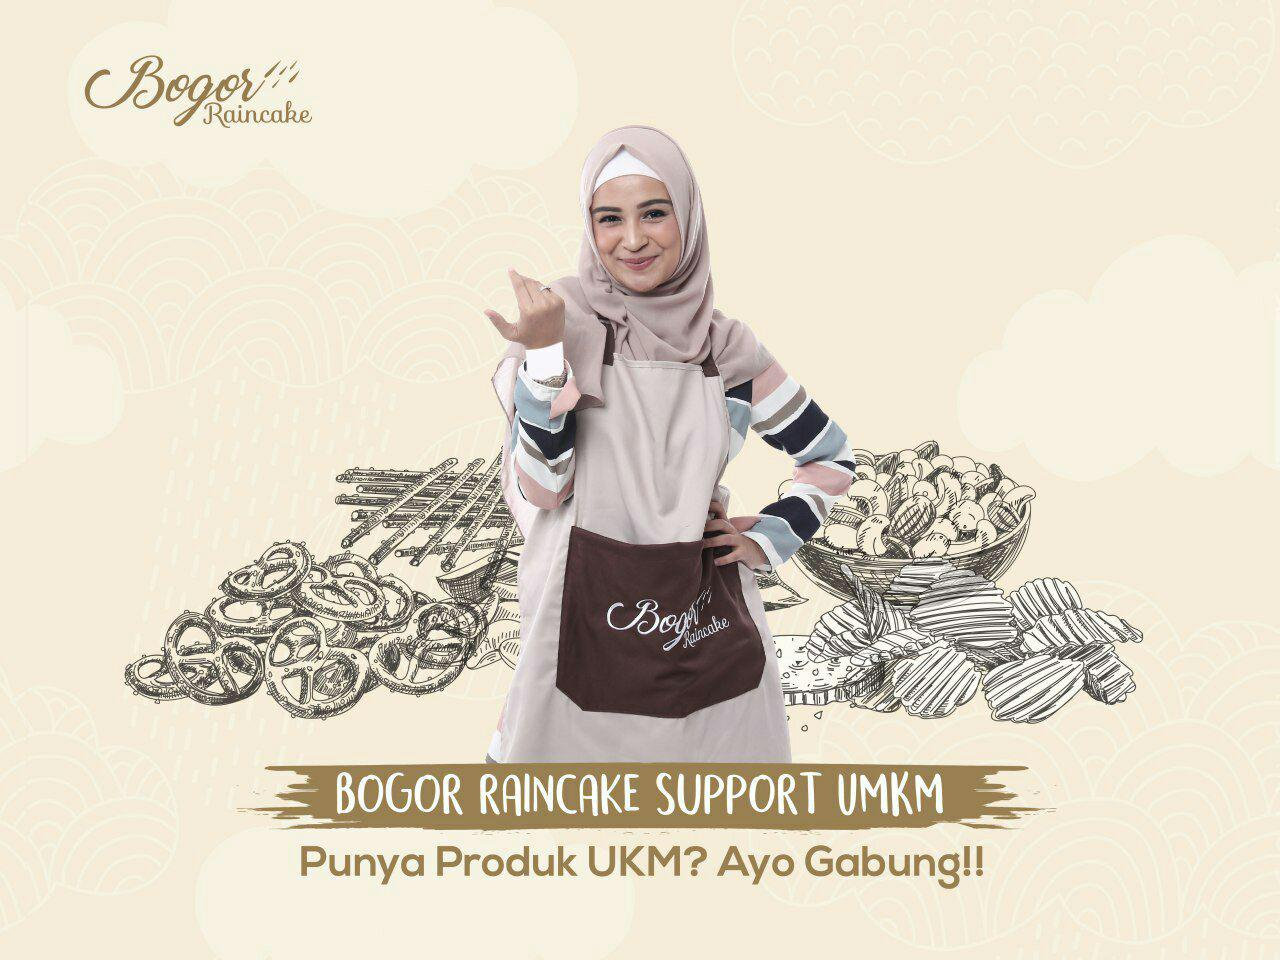 Bogor Raincake Support UMKM Bogor